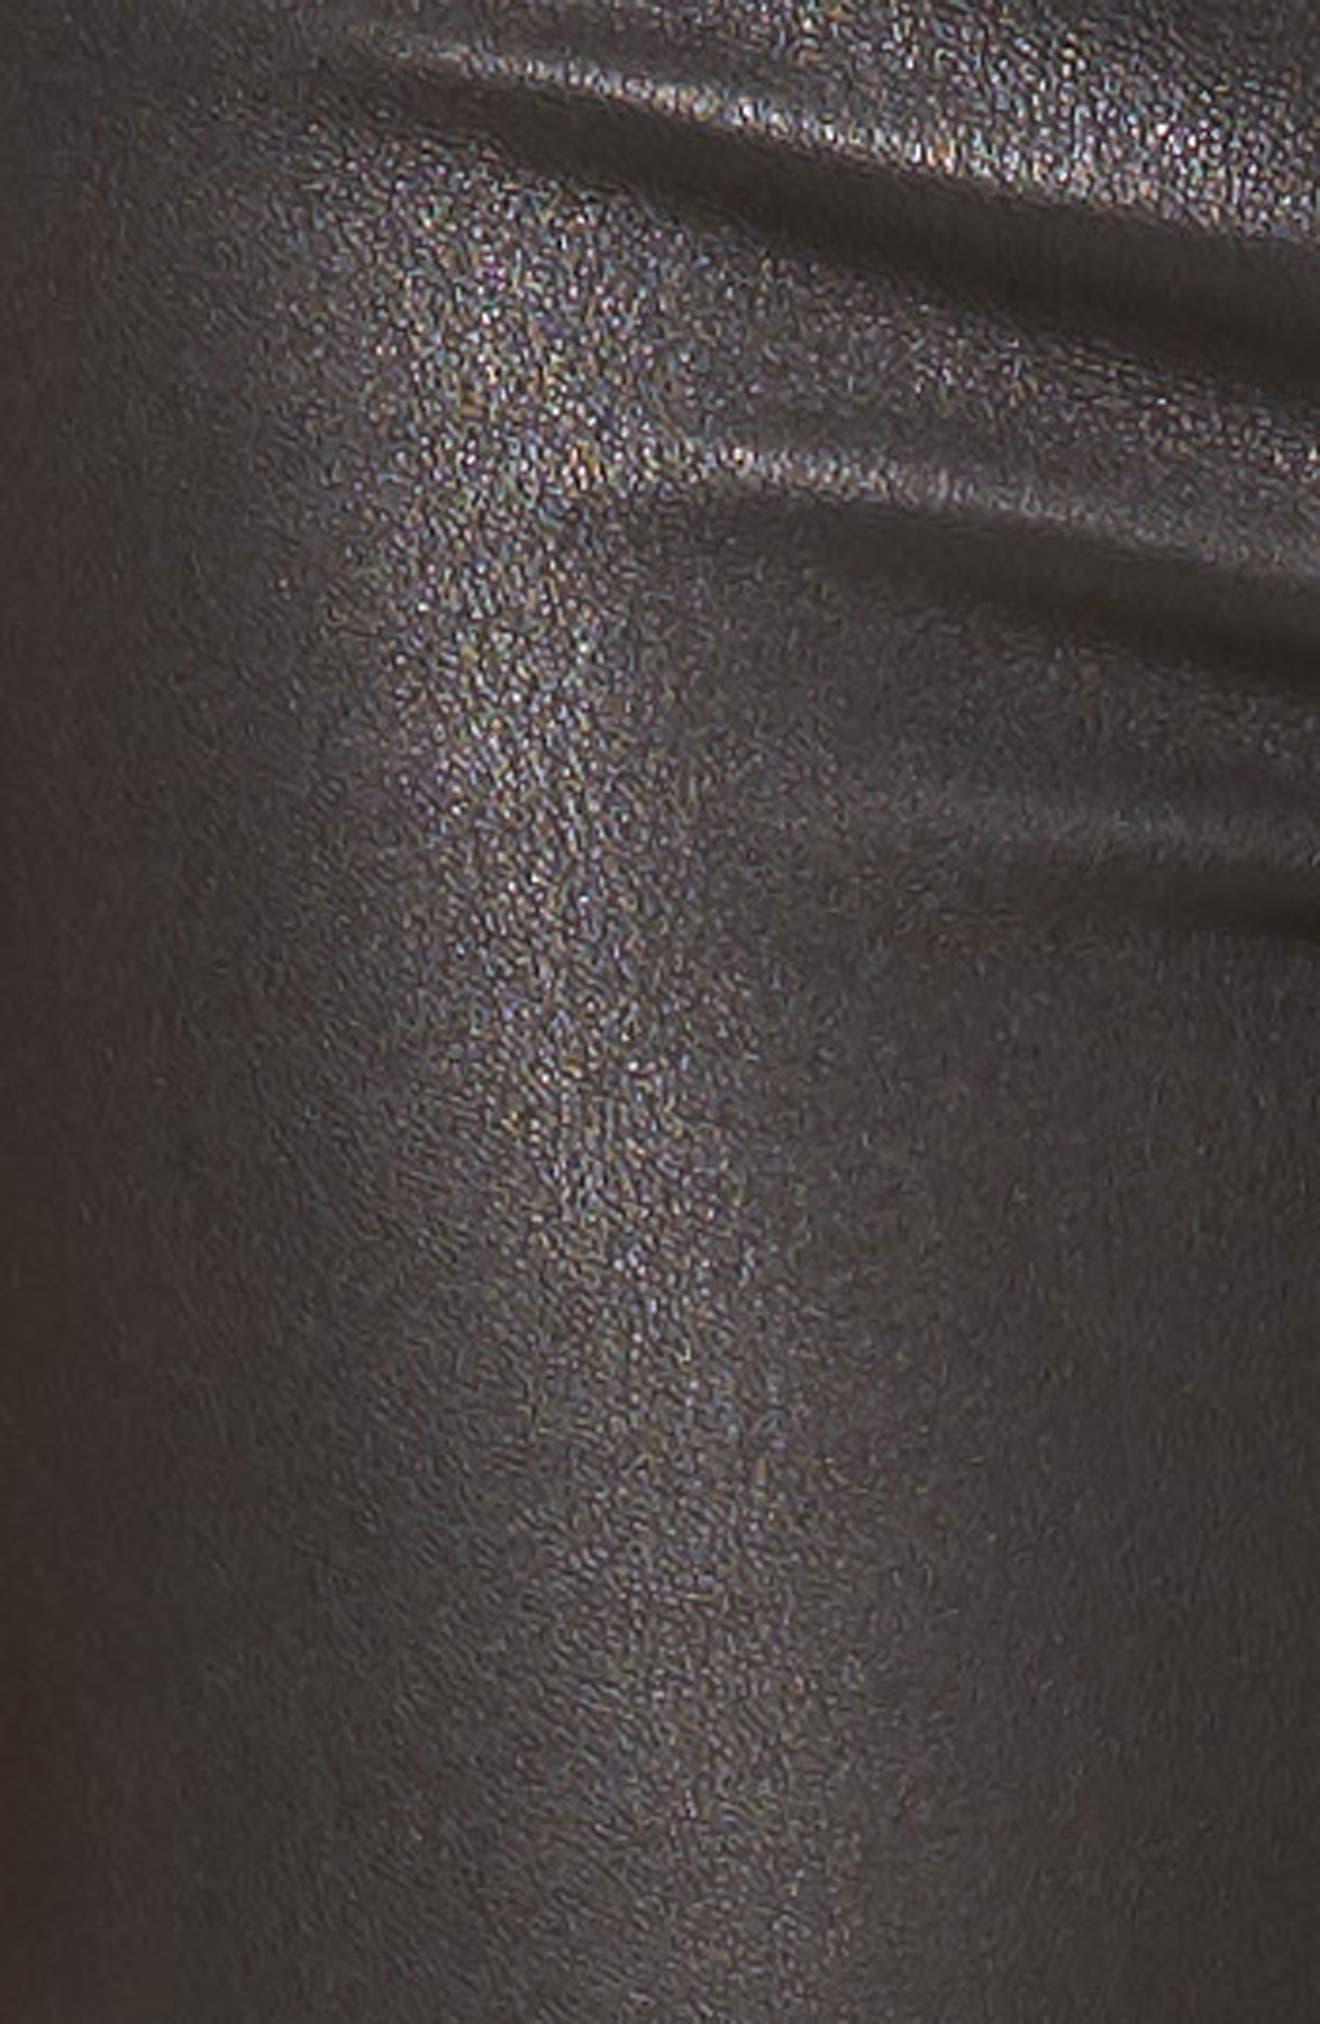 Nix High Waist Leather Skinny Pants,                             Alternate thumbnail 5, color,                             001